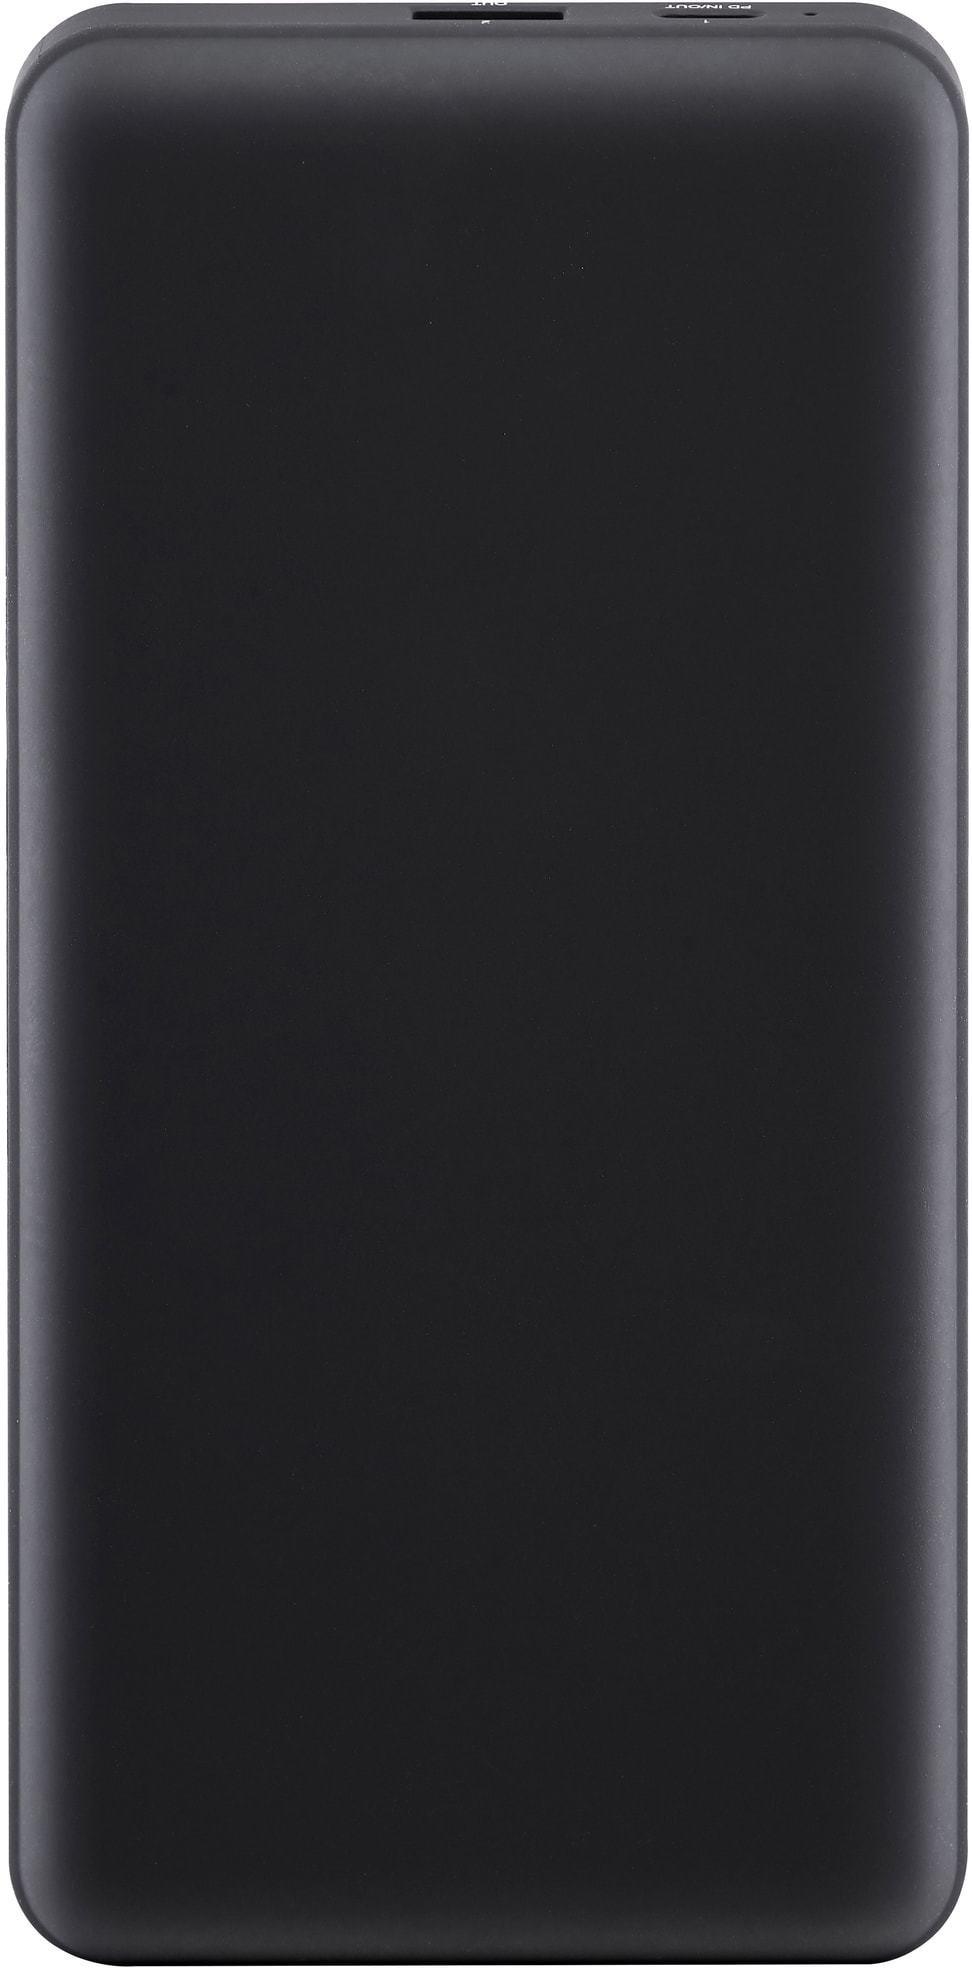 Sandstrøm 20 100 mAh USB type C powerbank (aluminium